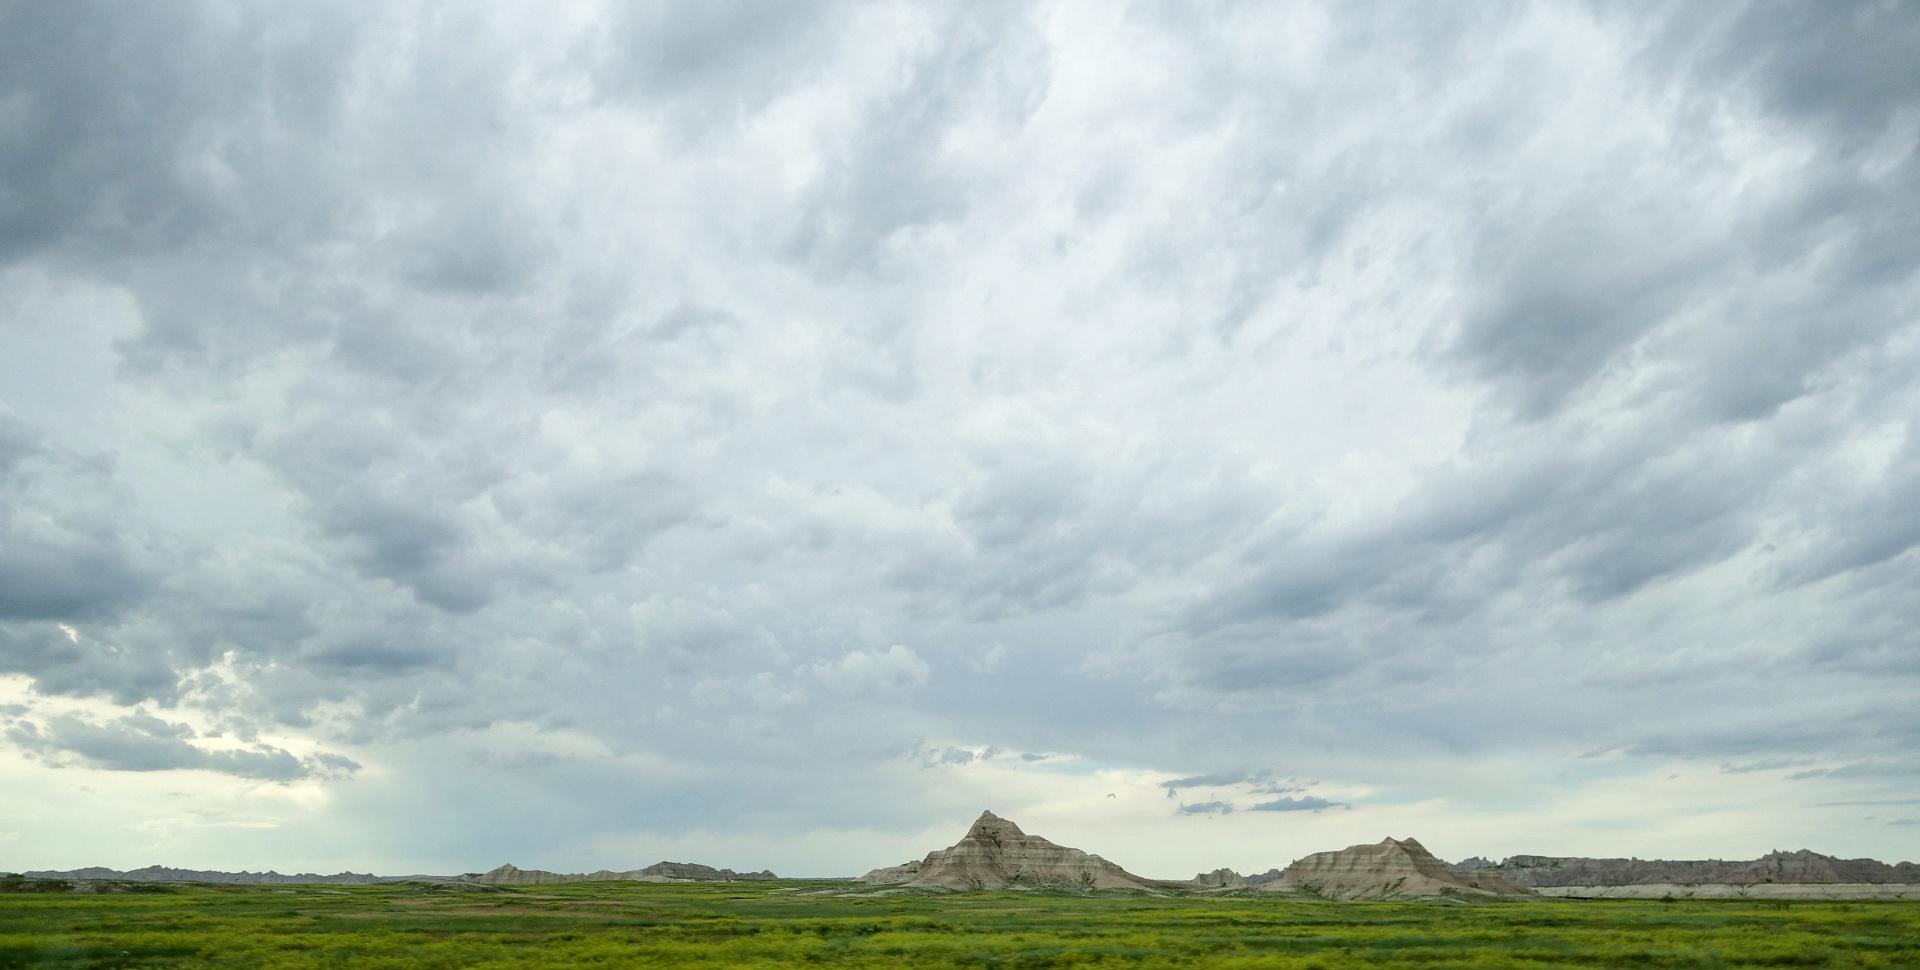 Aufziehender Sturm Badlands - Süddakota